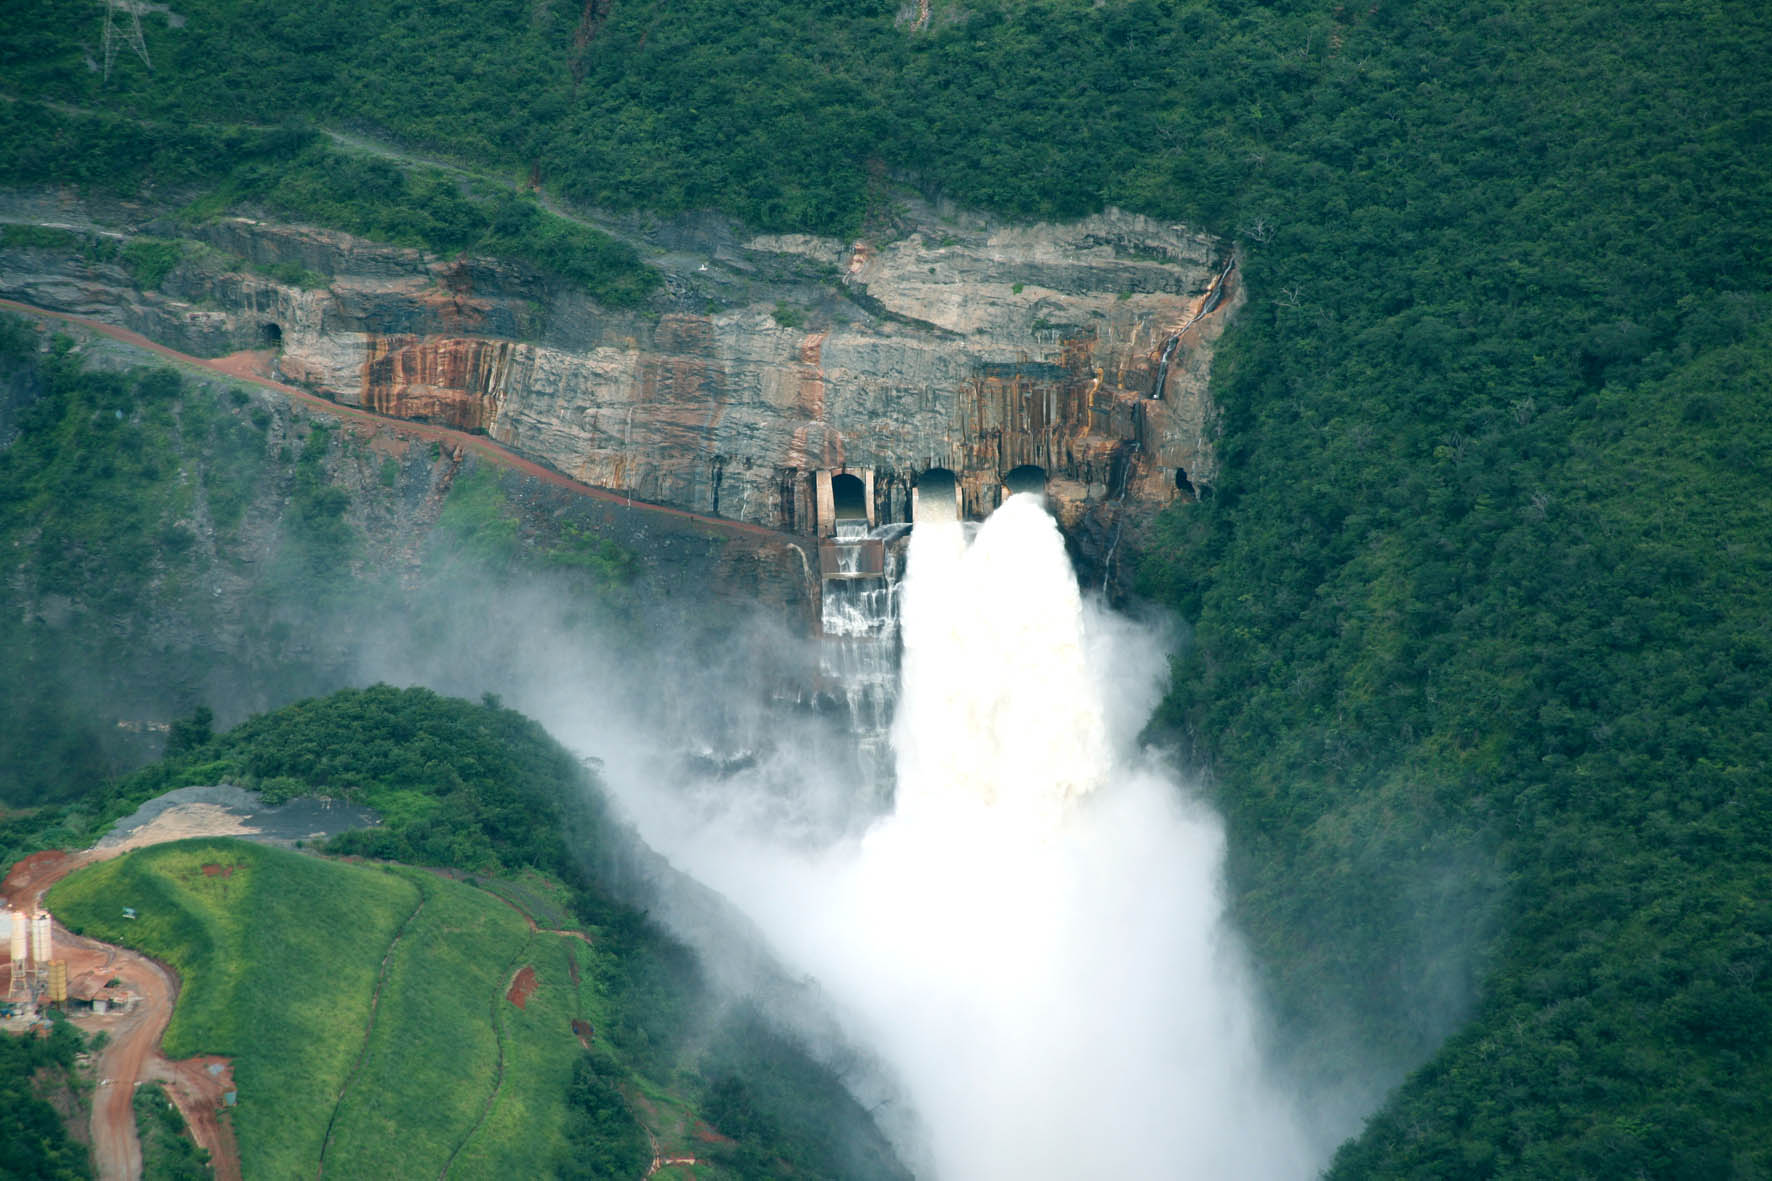 Usina Hidrelétrica de Igarapé